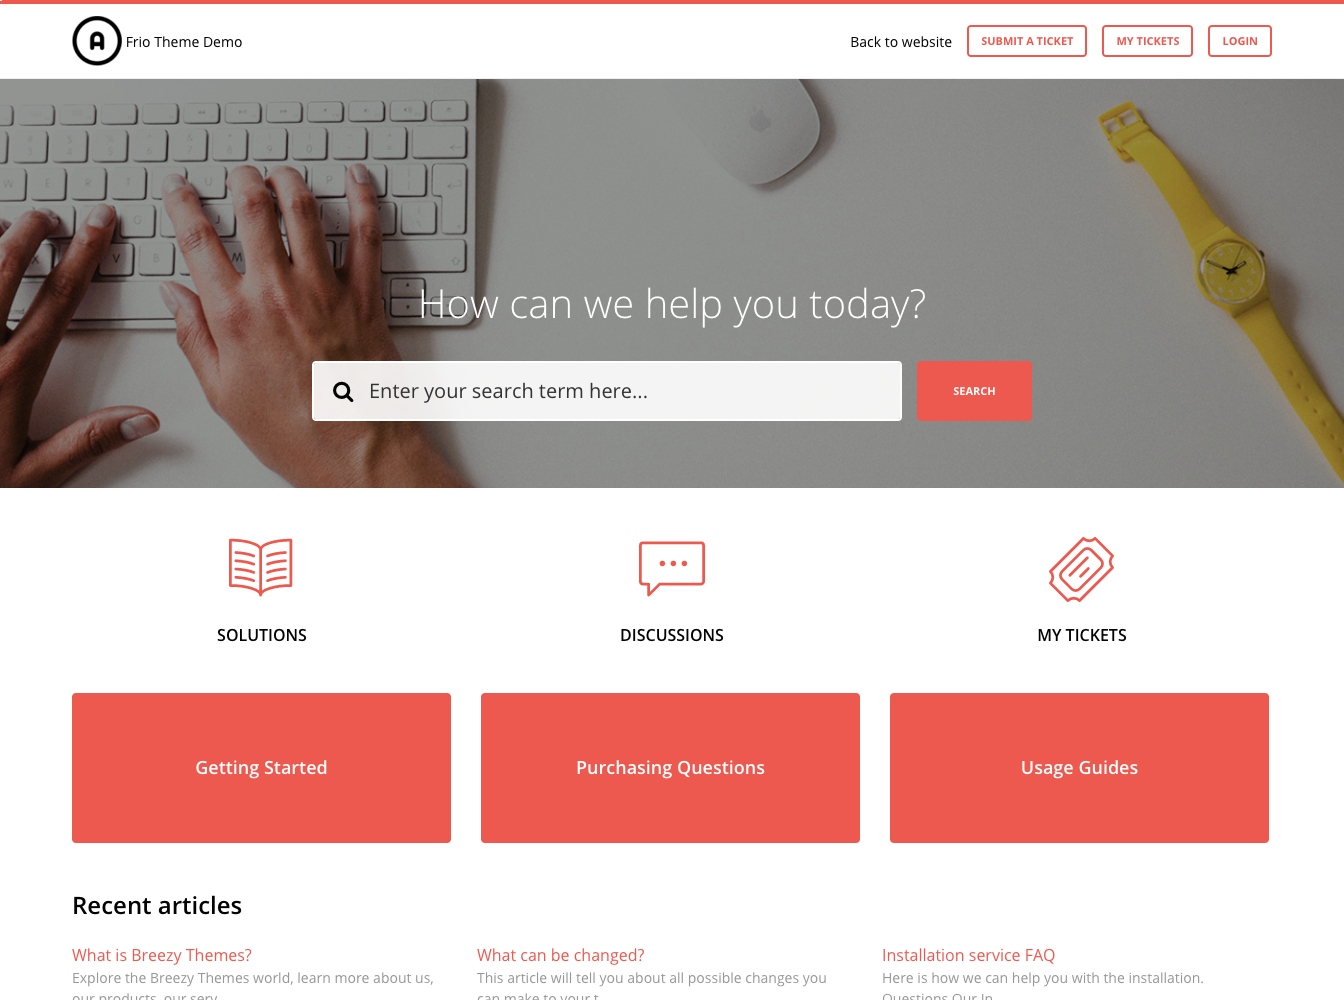 Frio Red Theme for Freshdesk Customer Portal-homepage